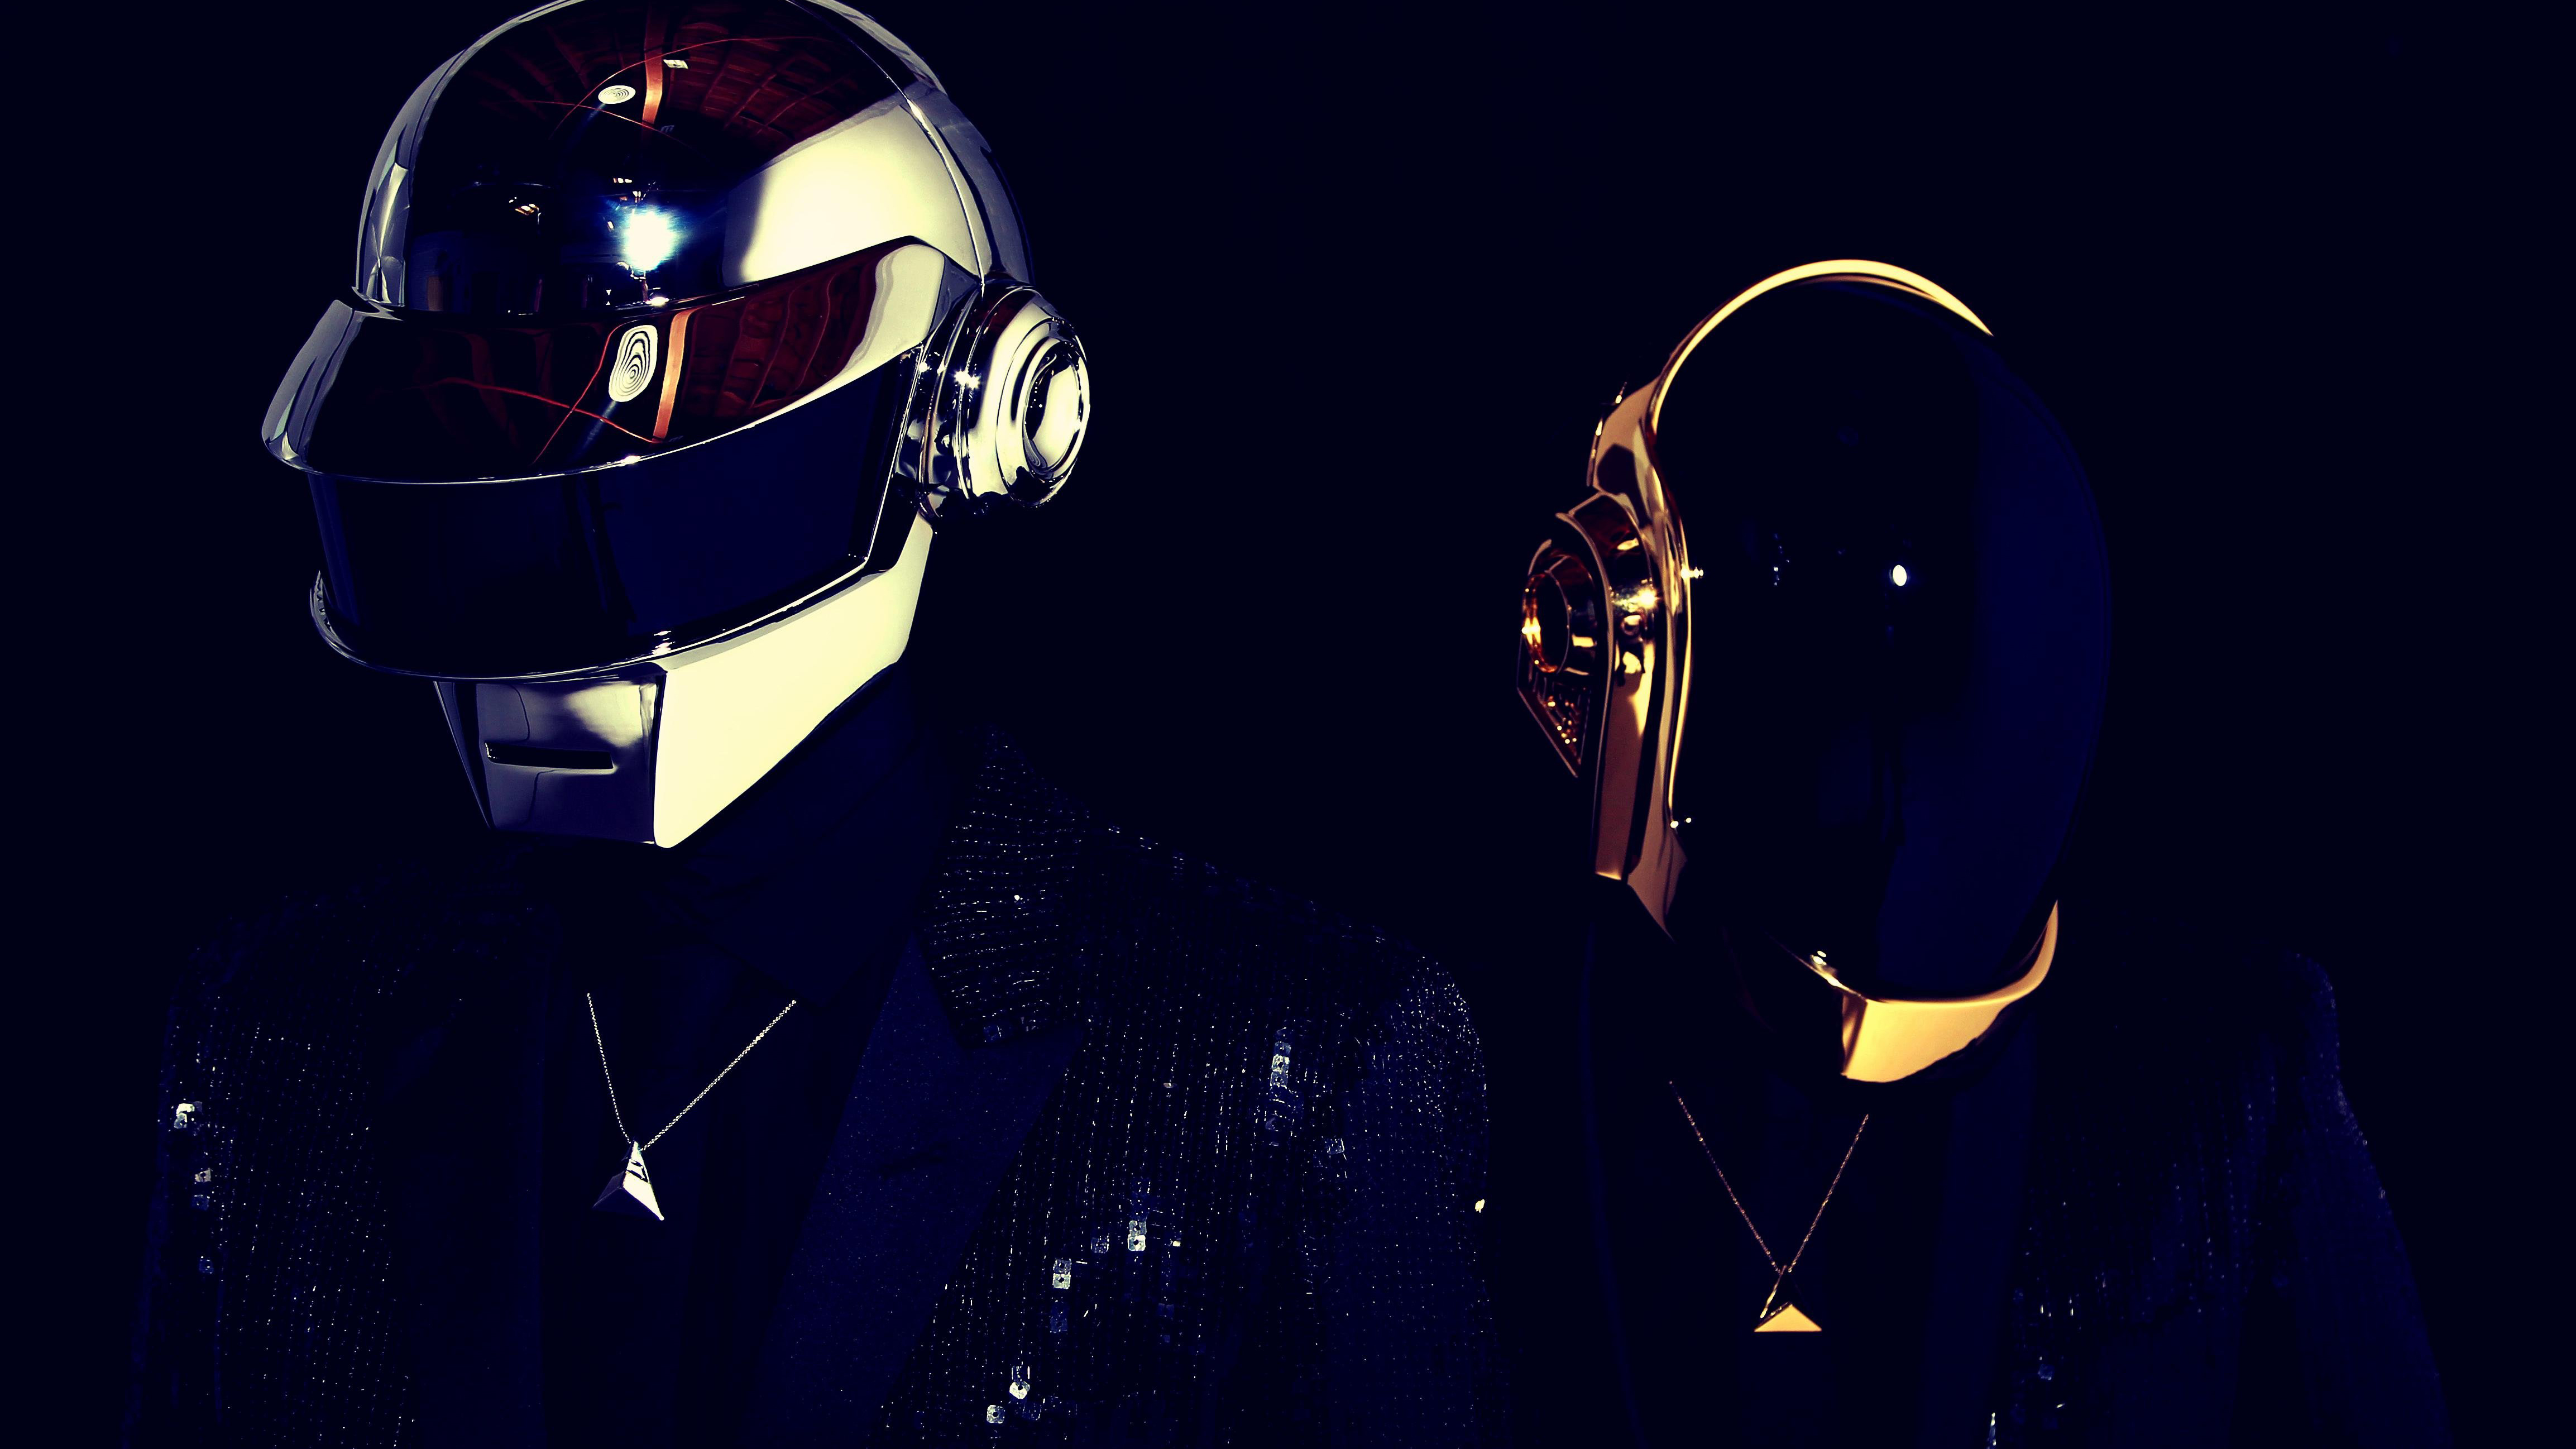 Daft Punk 4K Wallpapers | HD Wallpapers